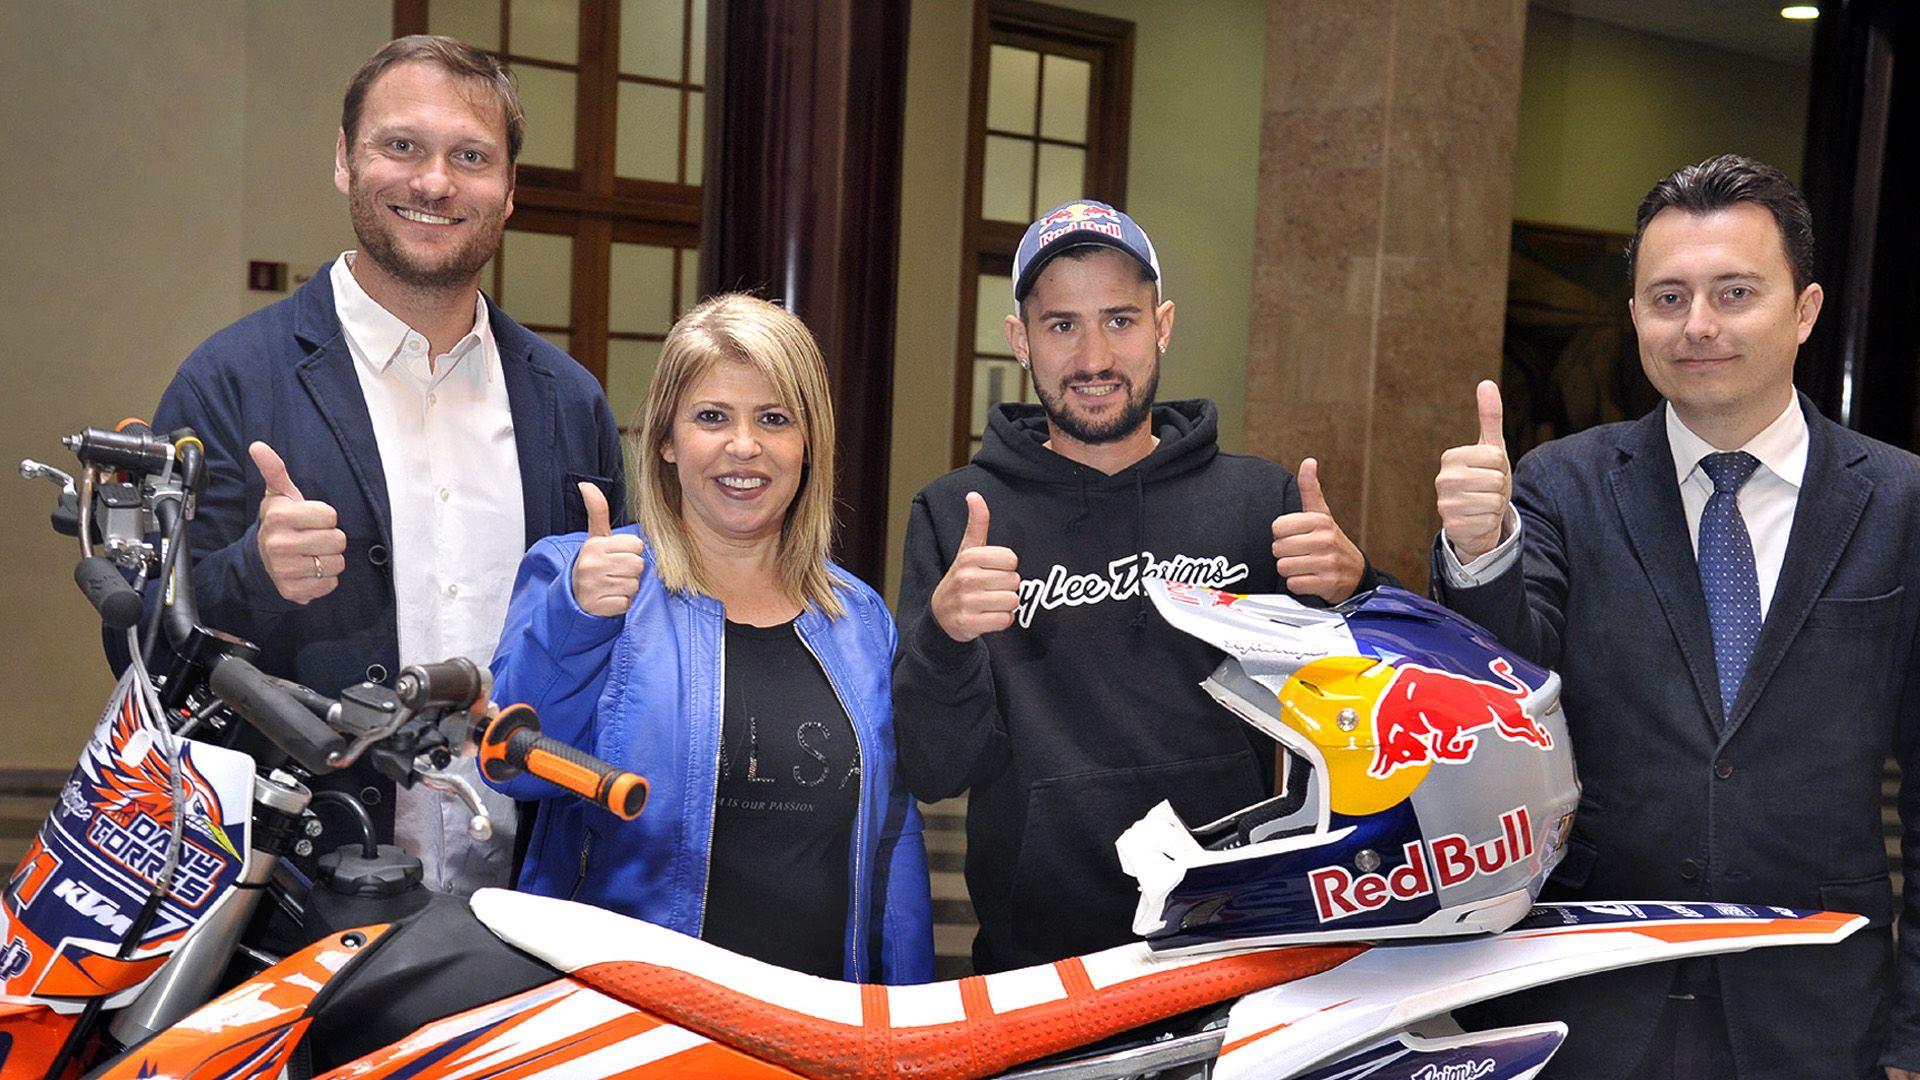 Alcaldesa pres actividades paralelas al Mundial Motociclismo _ 01